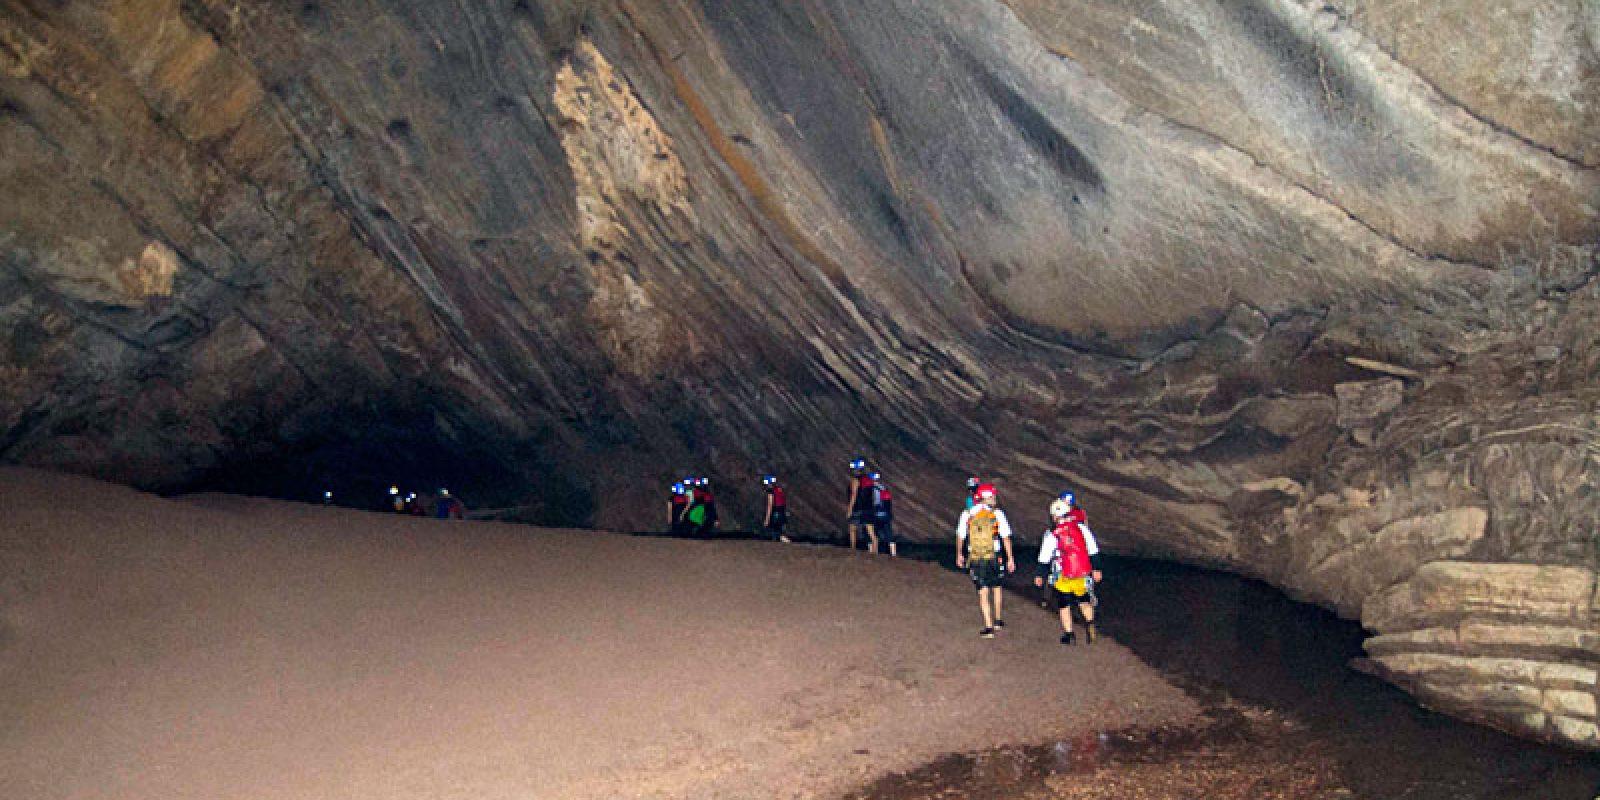 taxco-cueva-miguel-jimenez